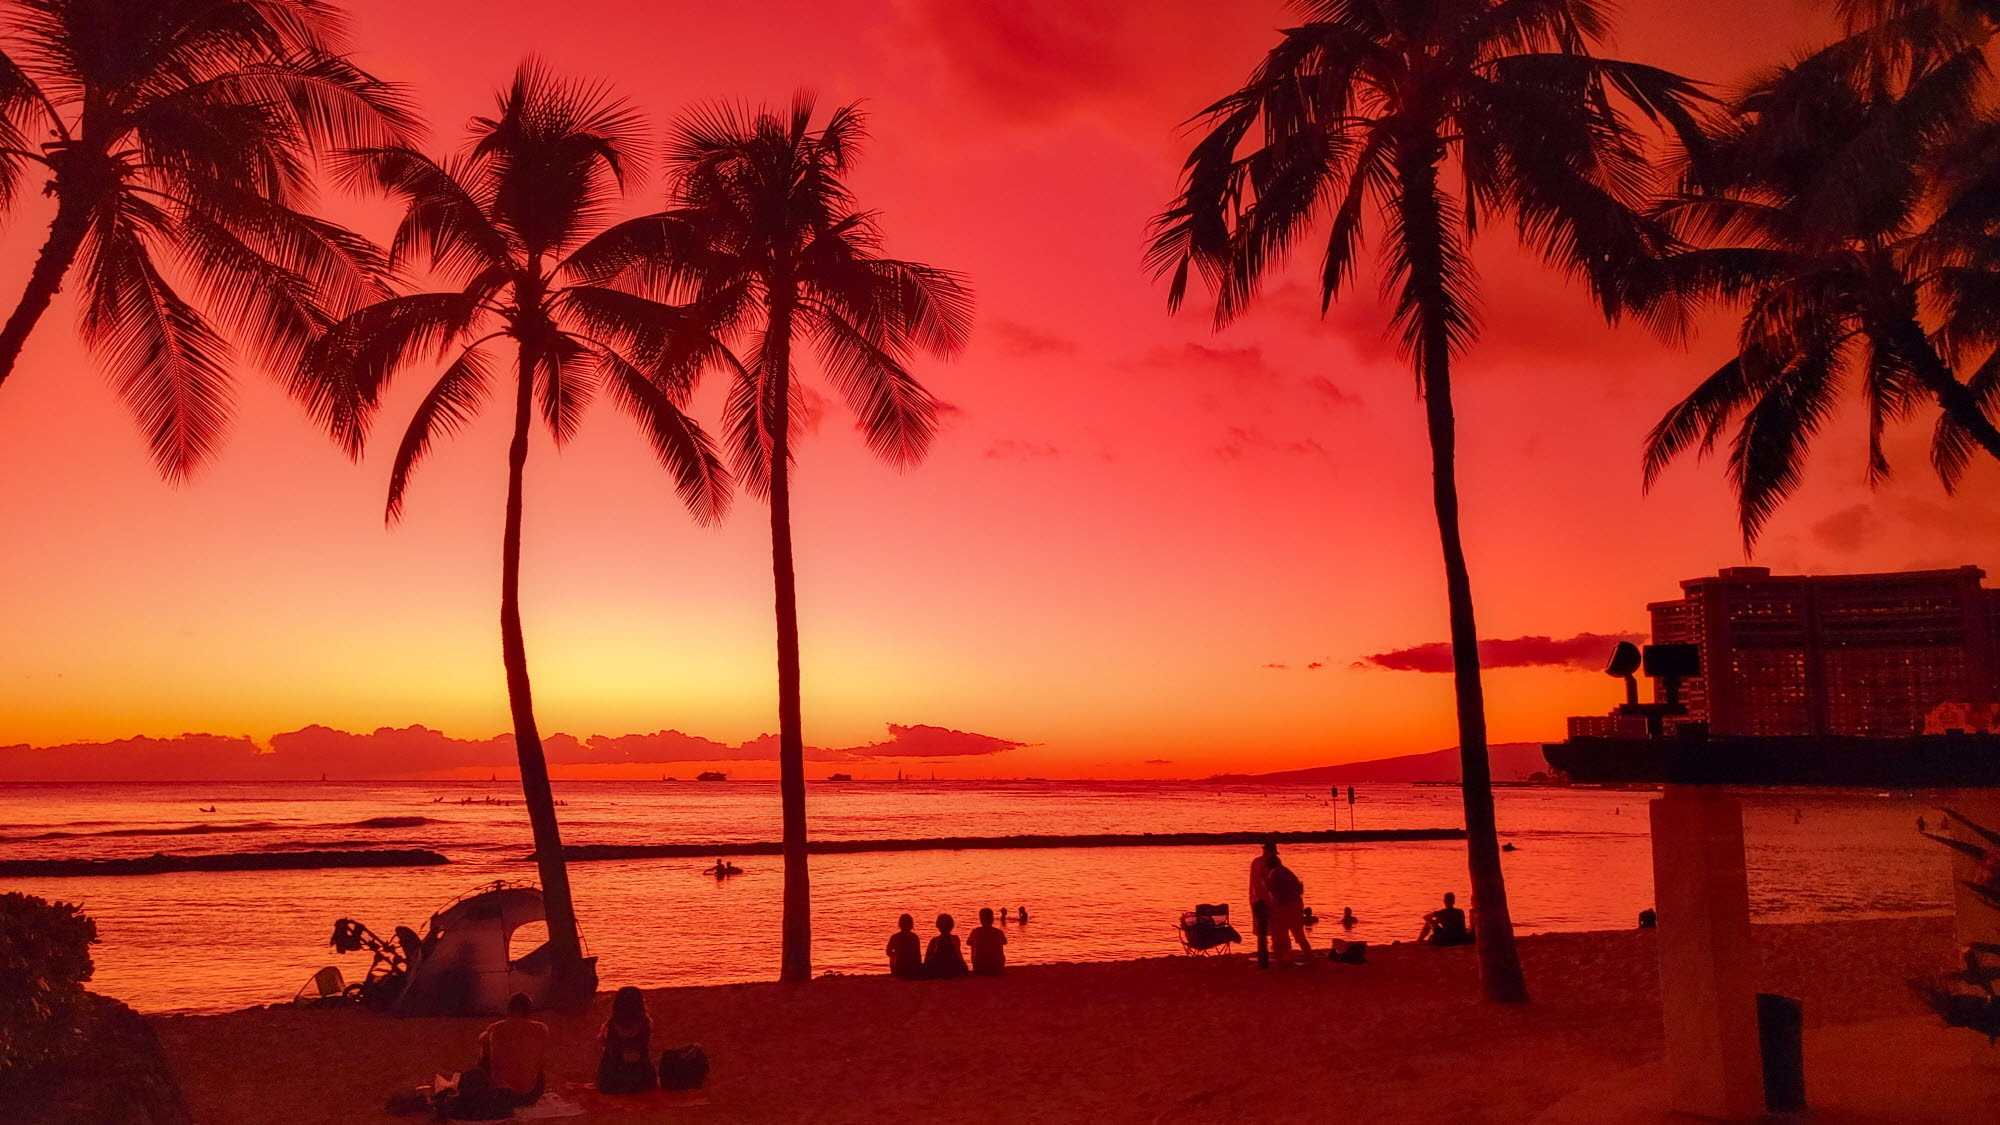 LG V50S로 촬영한 하와이 사진03 (F/1.8 , 1/43초, ISO-100)